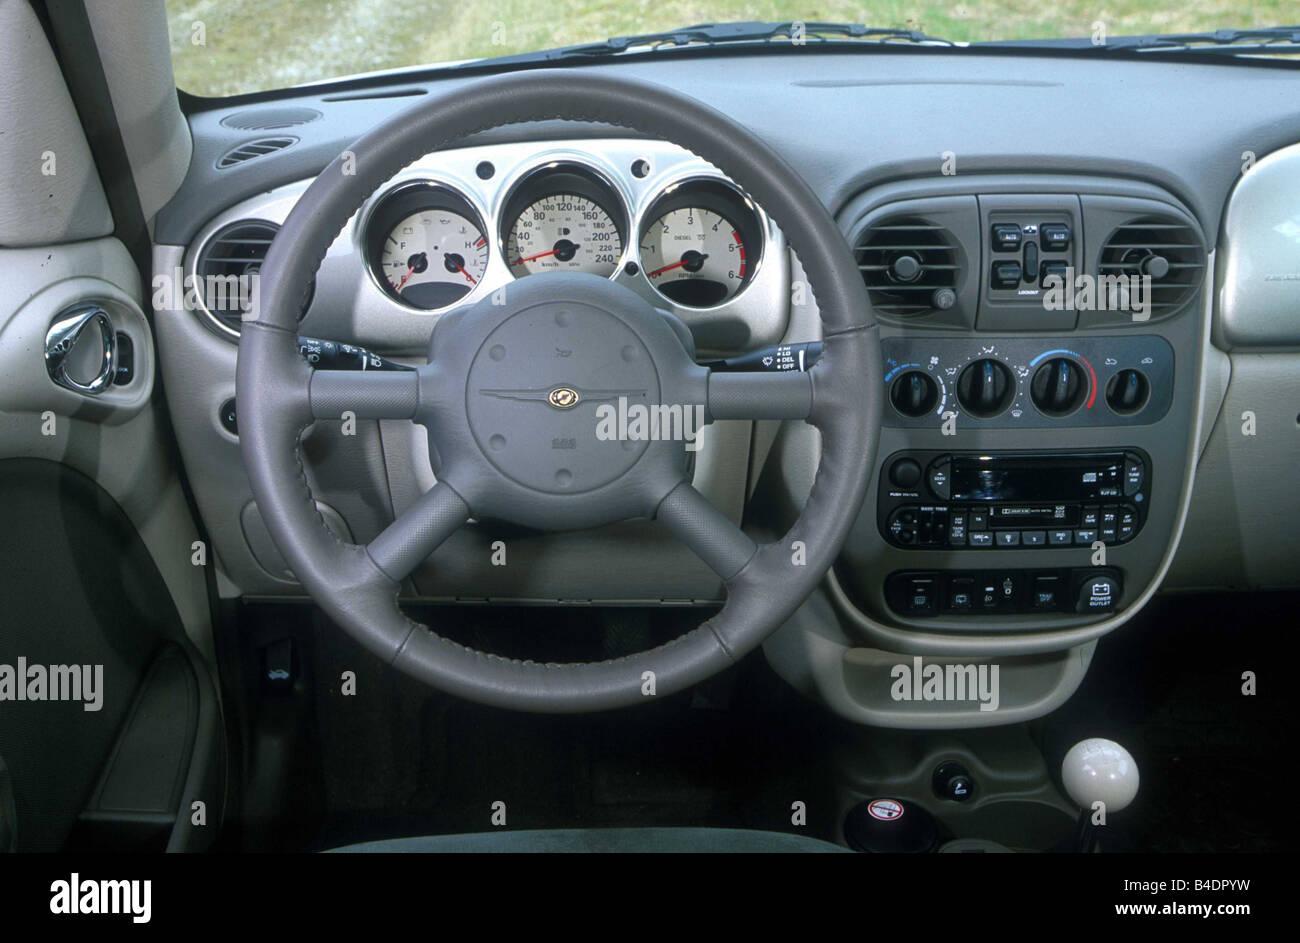 Car, Chrysler PT Cruiser 2.2 CRD, Van, Model Year 2000 , Silver